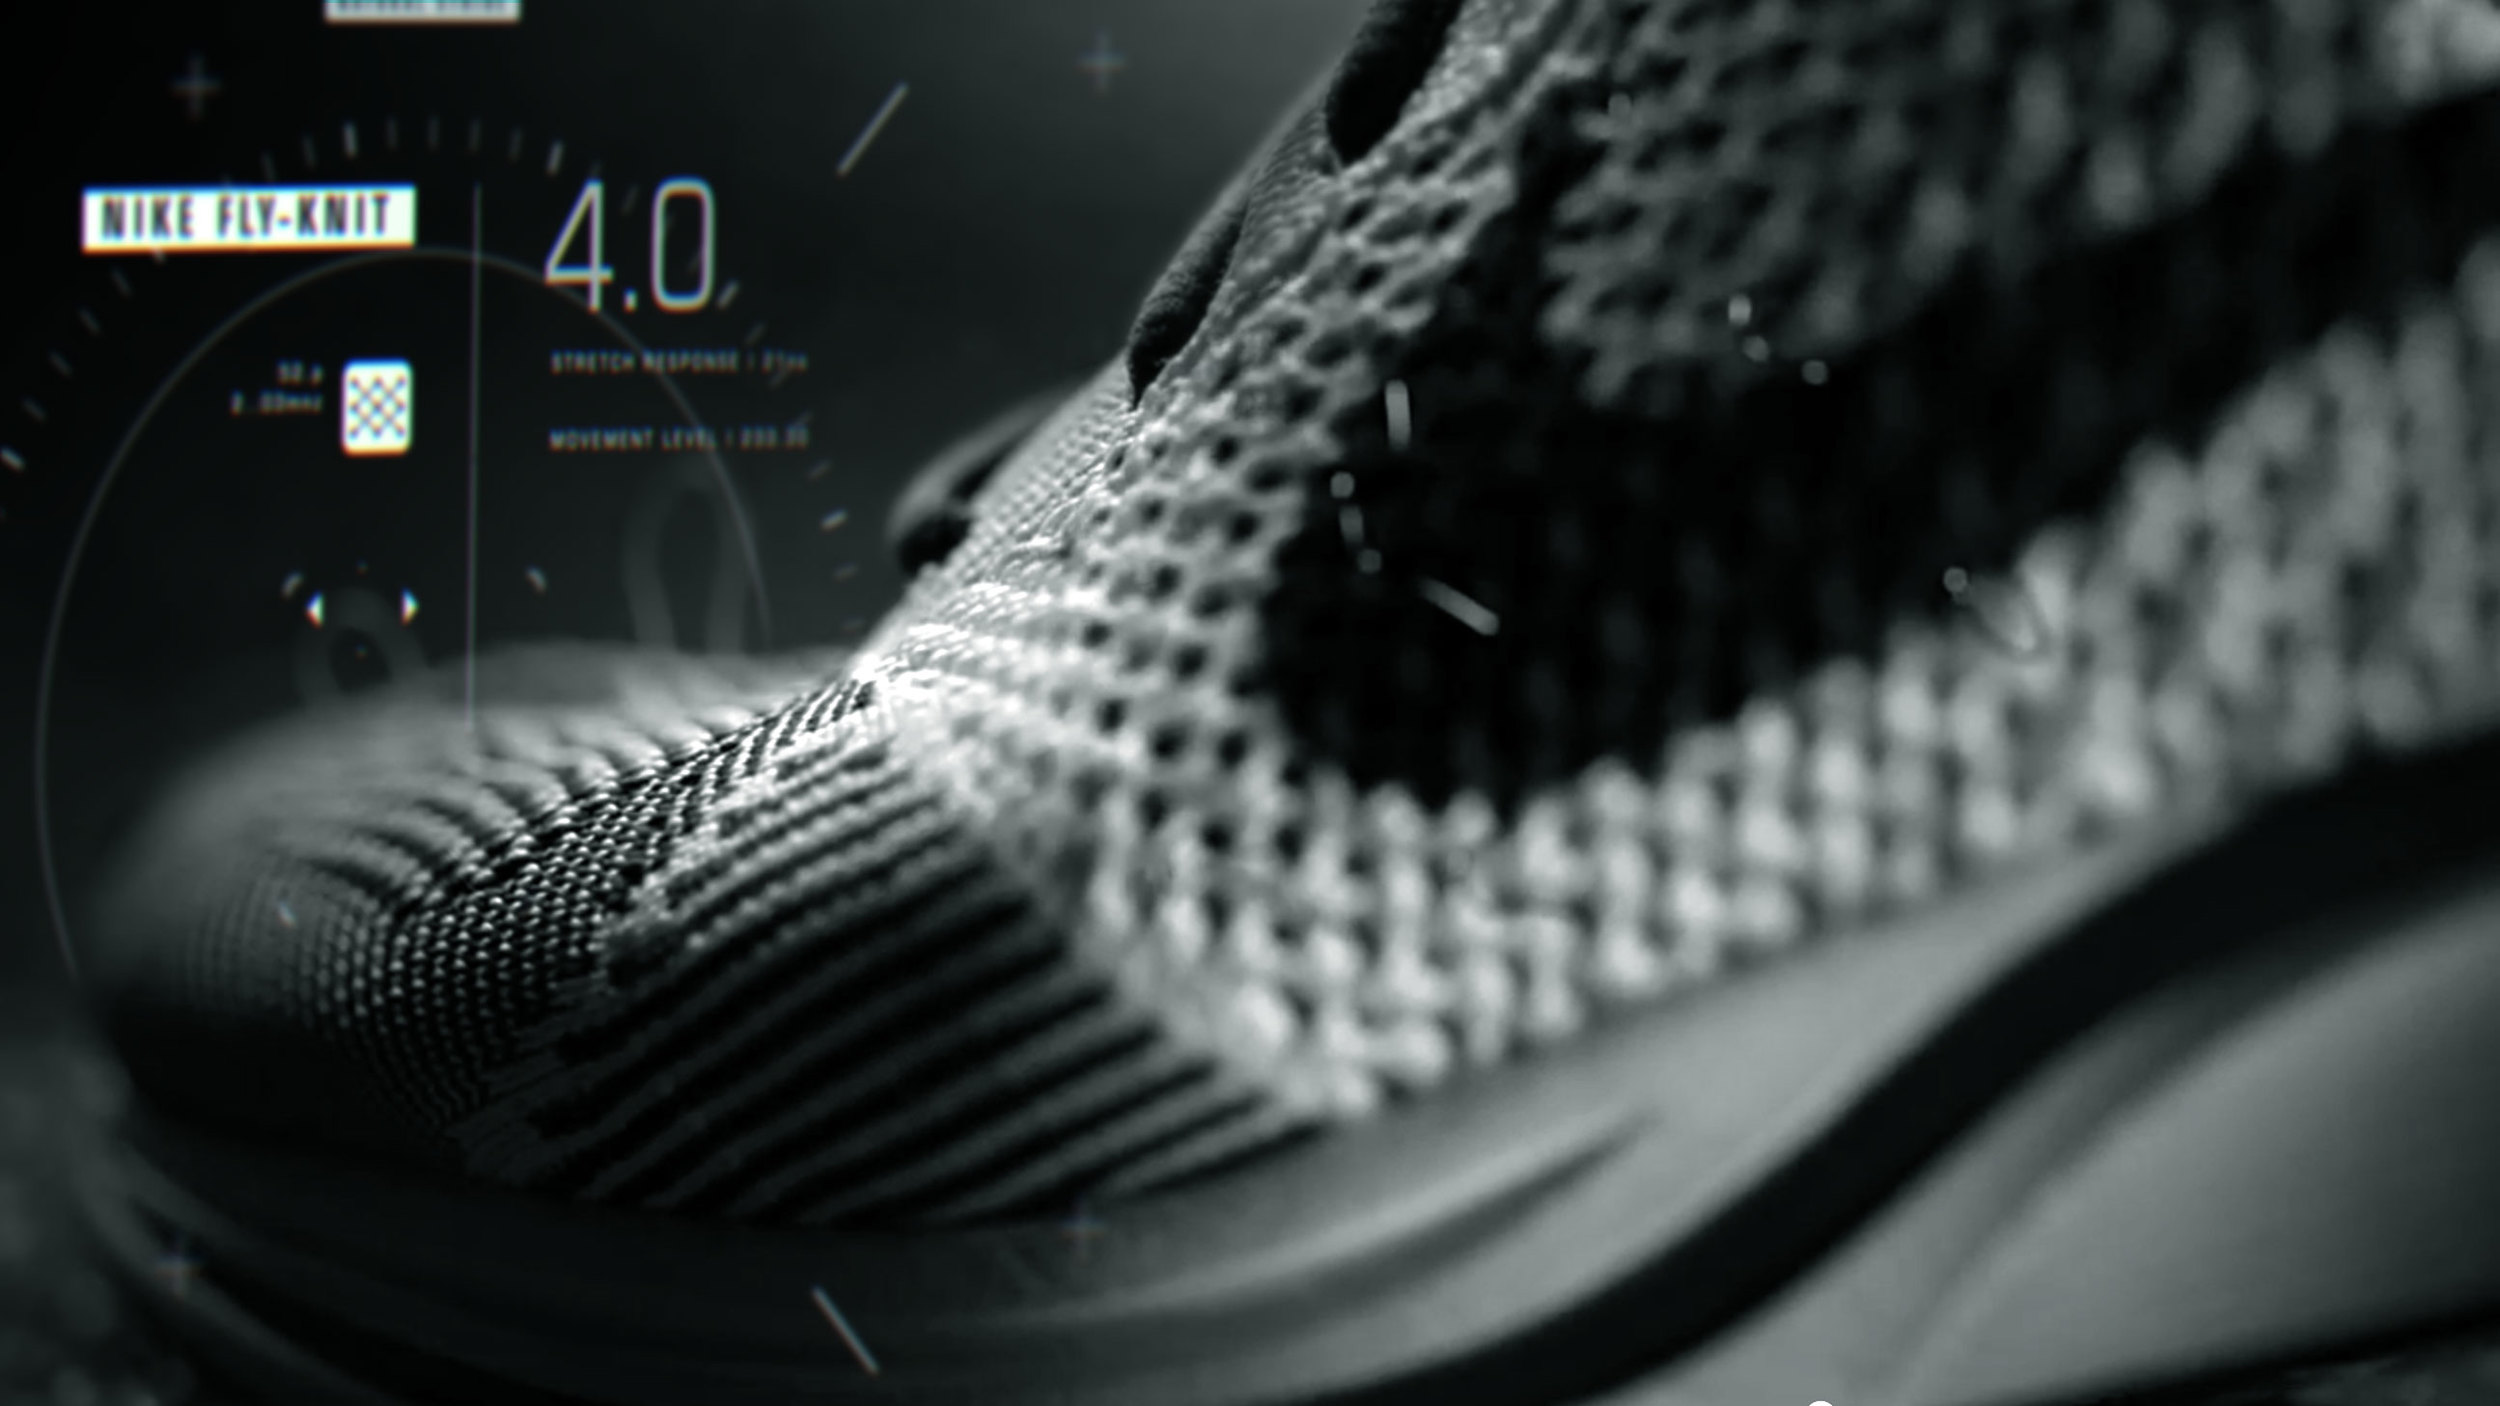 SV_NikeStyleframe_04.jpg